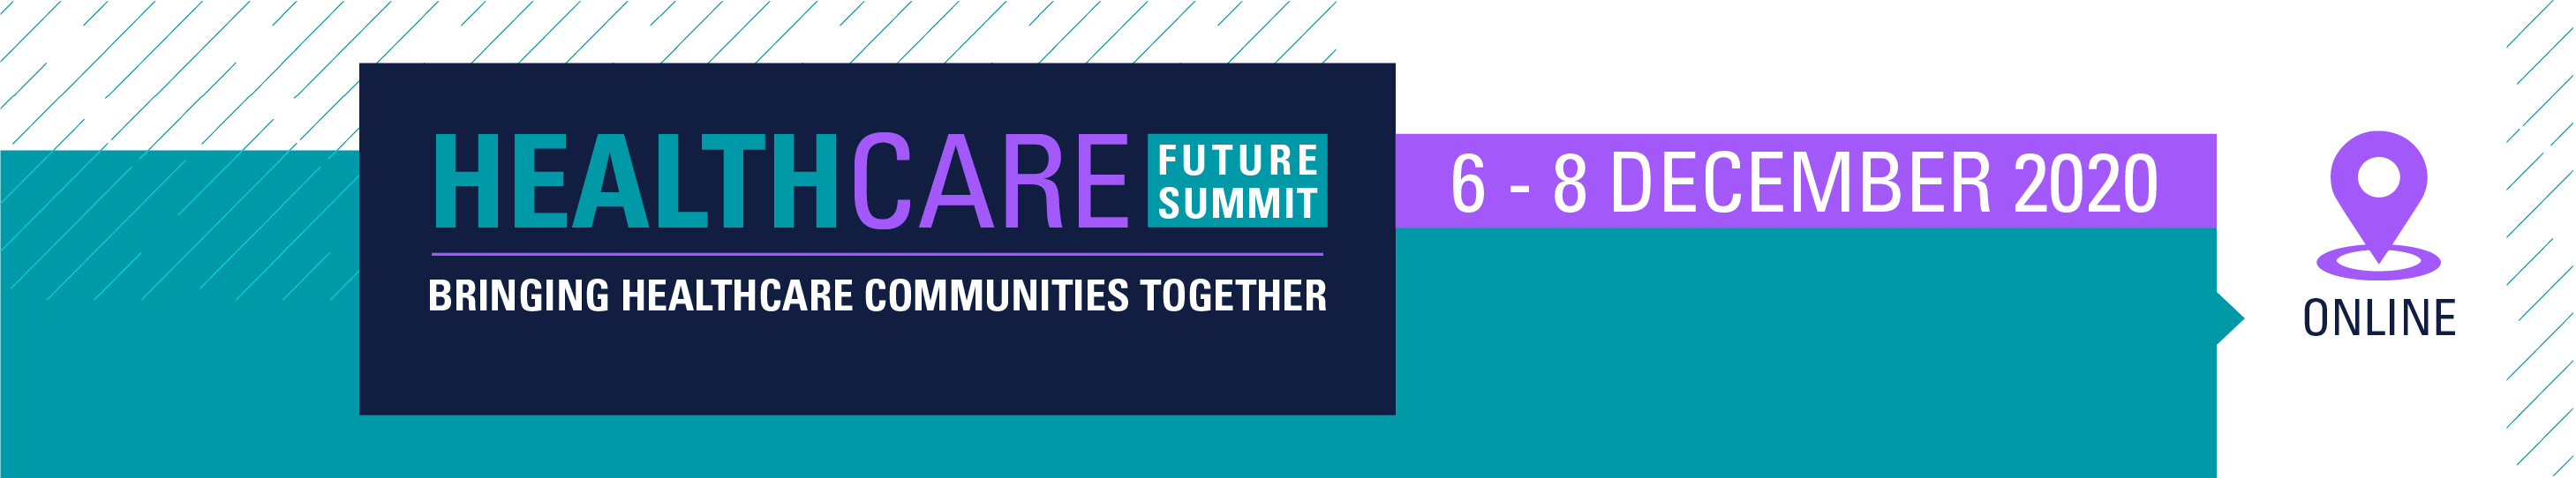 Healthcare Future Summit 2020